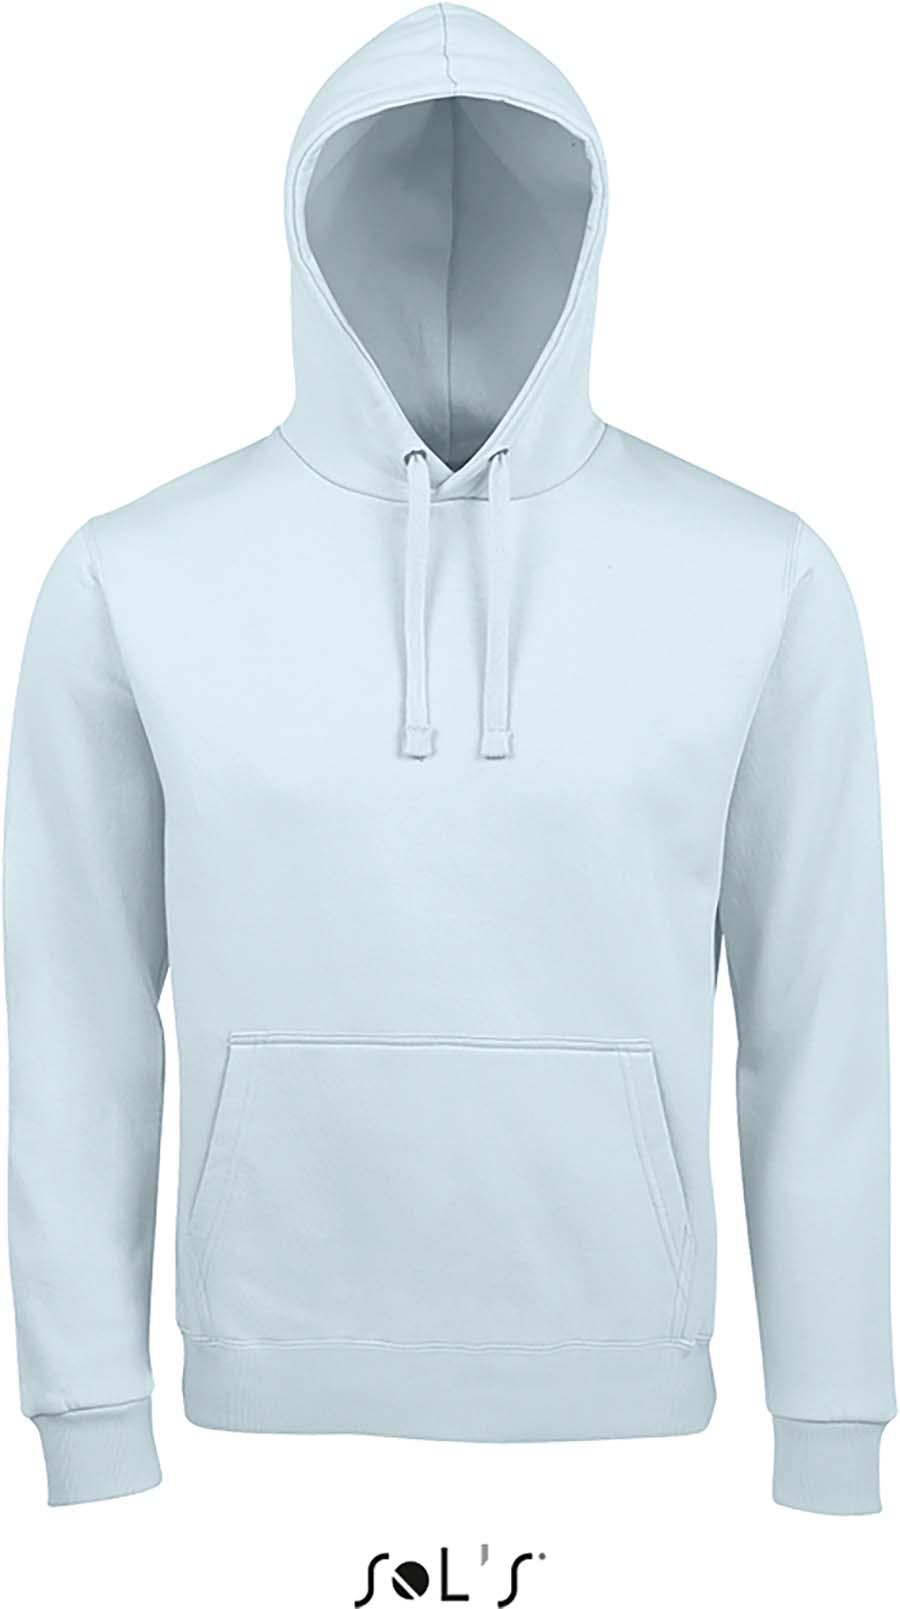 Sweat-shirt unisexe à capuche - 1-1403-10